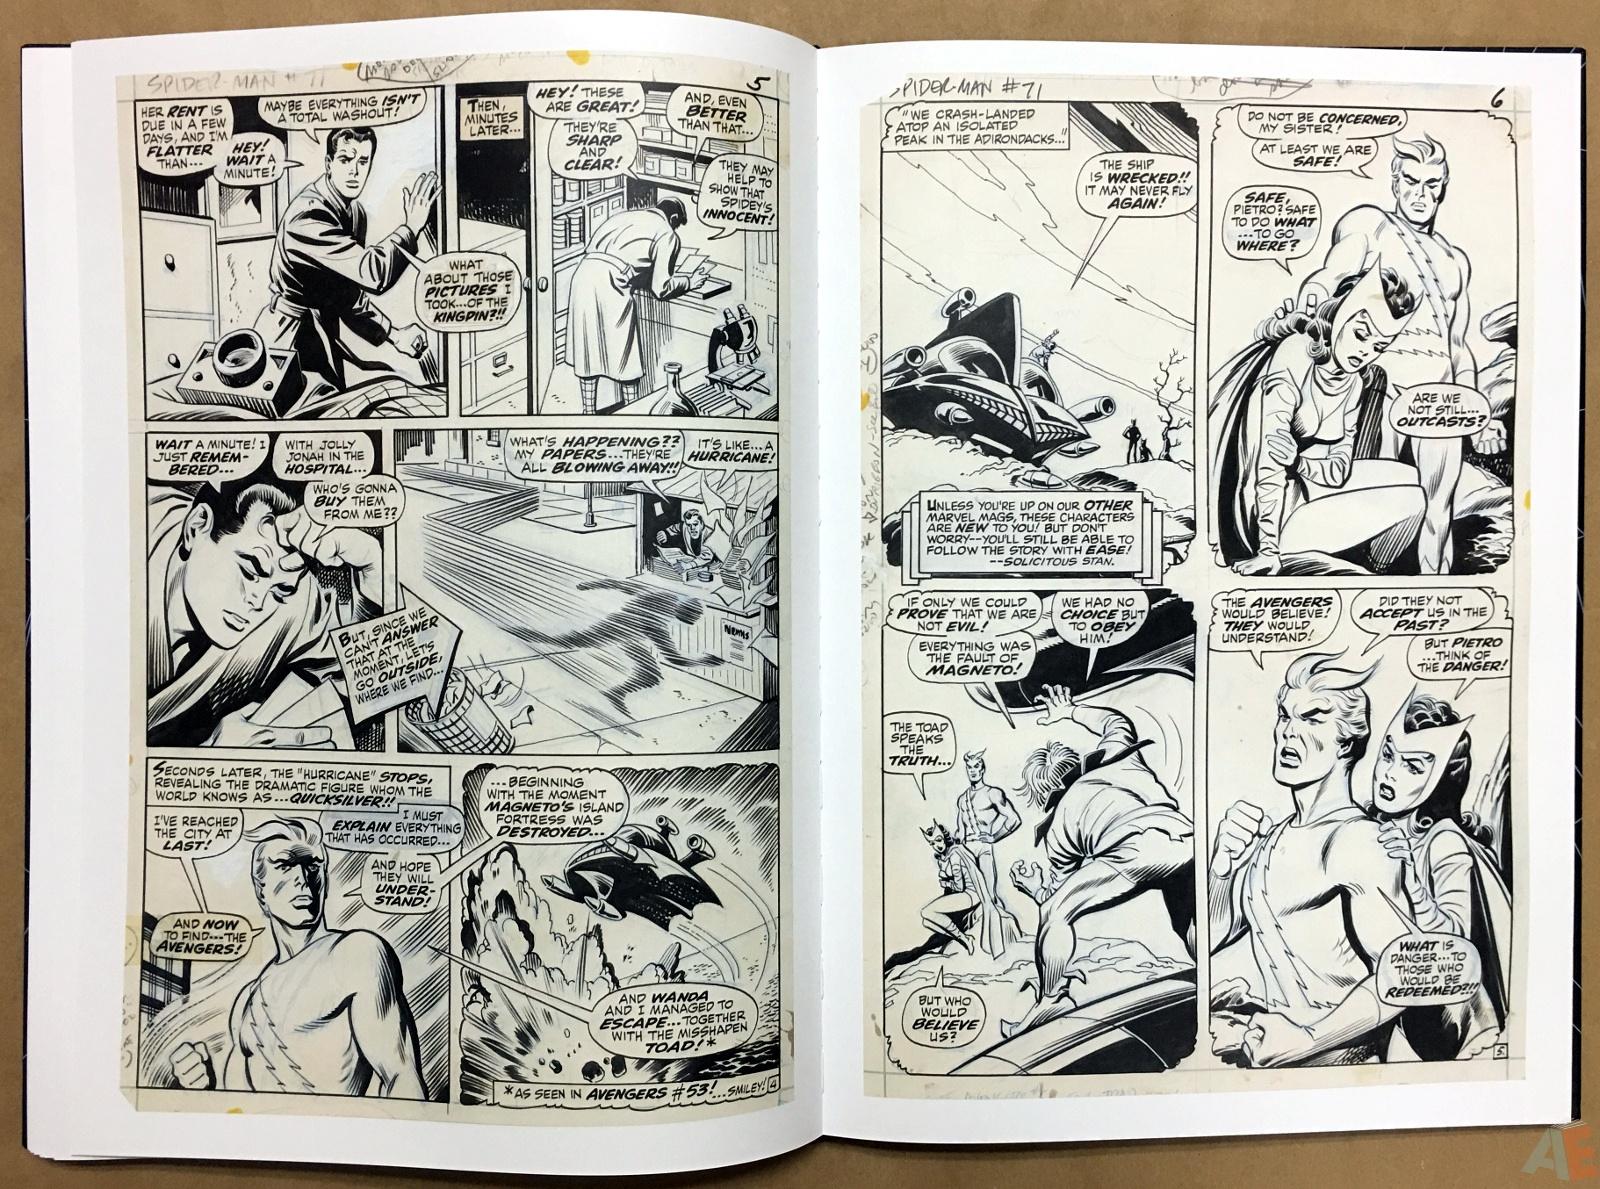 John Romita's The Amazing Spider-Man Artist's Edition 30